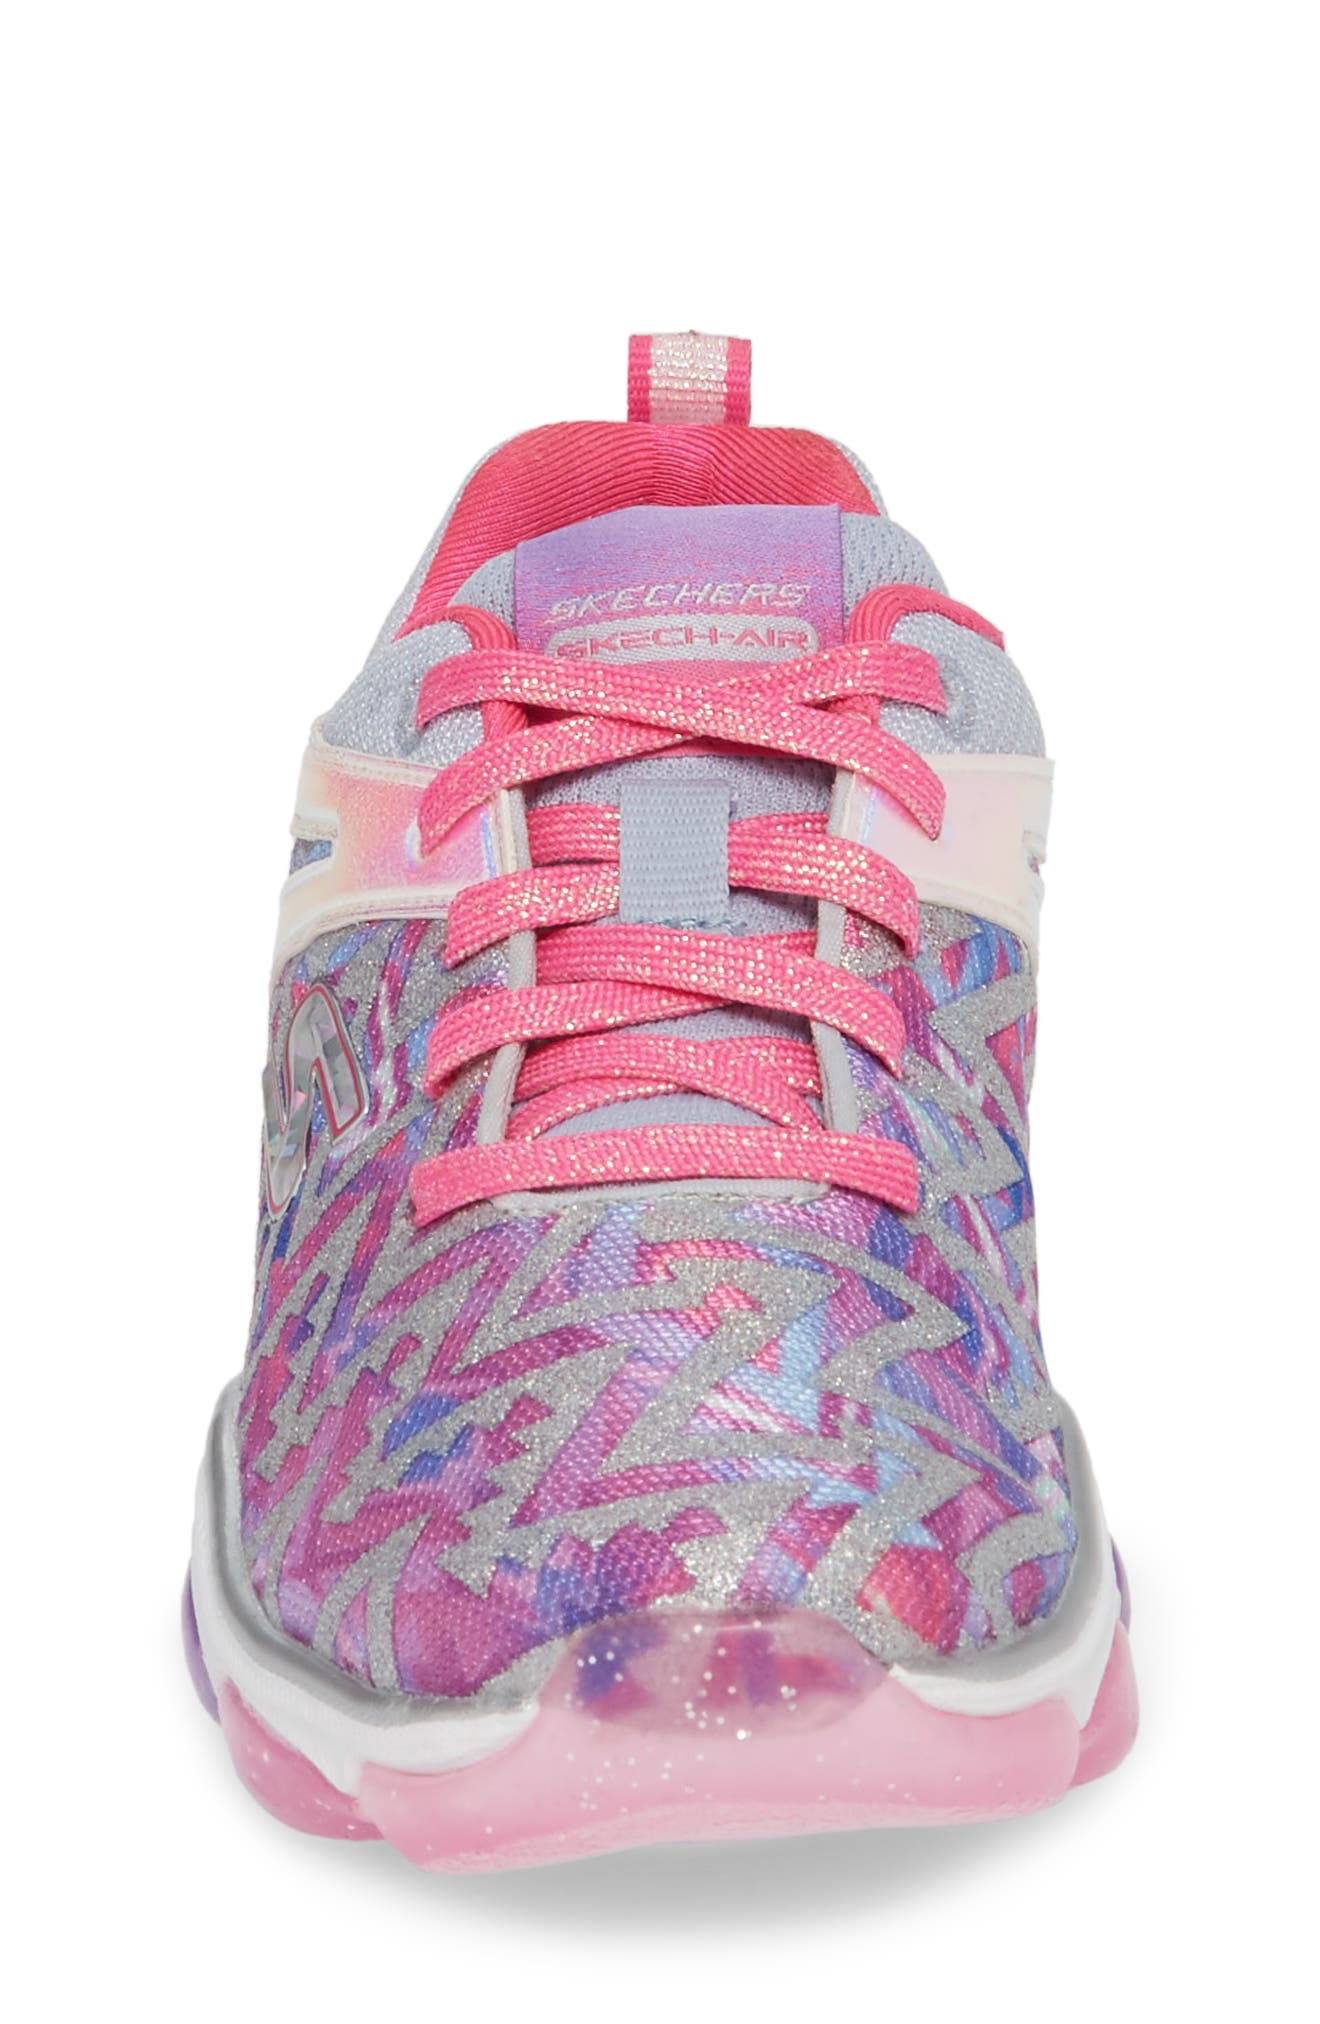 Skech Air Groove Glitter Sneaker,                             Alternate thumbnail 4, color,                             PINK/ MULTI